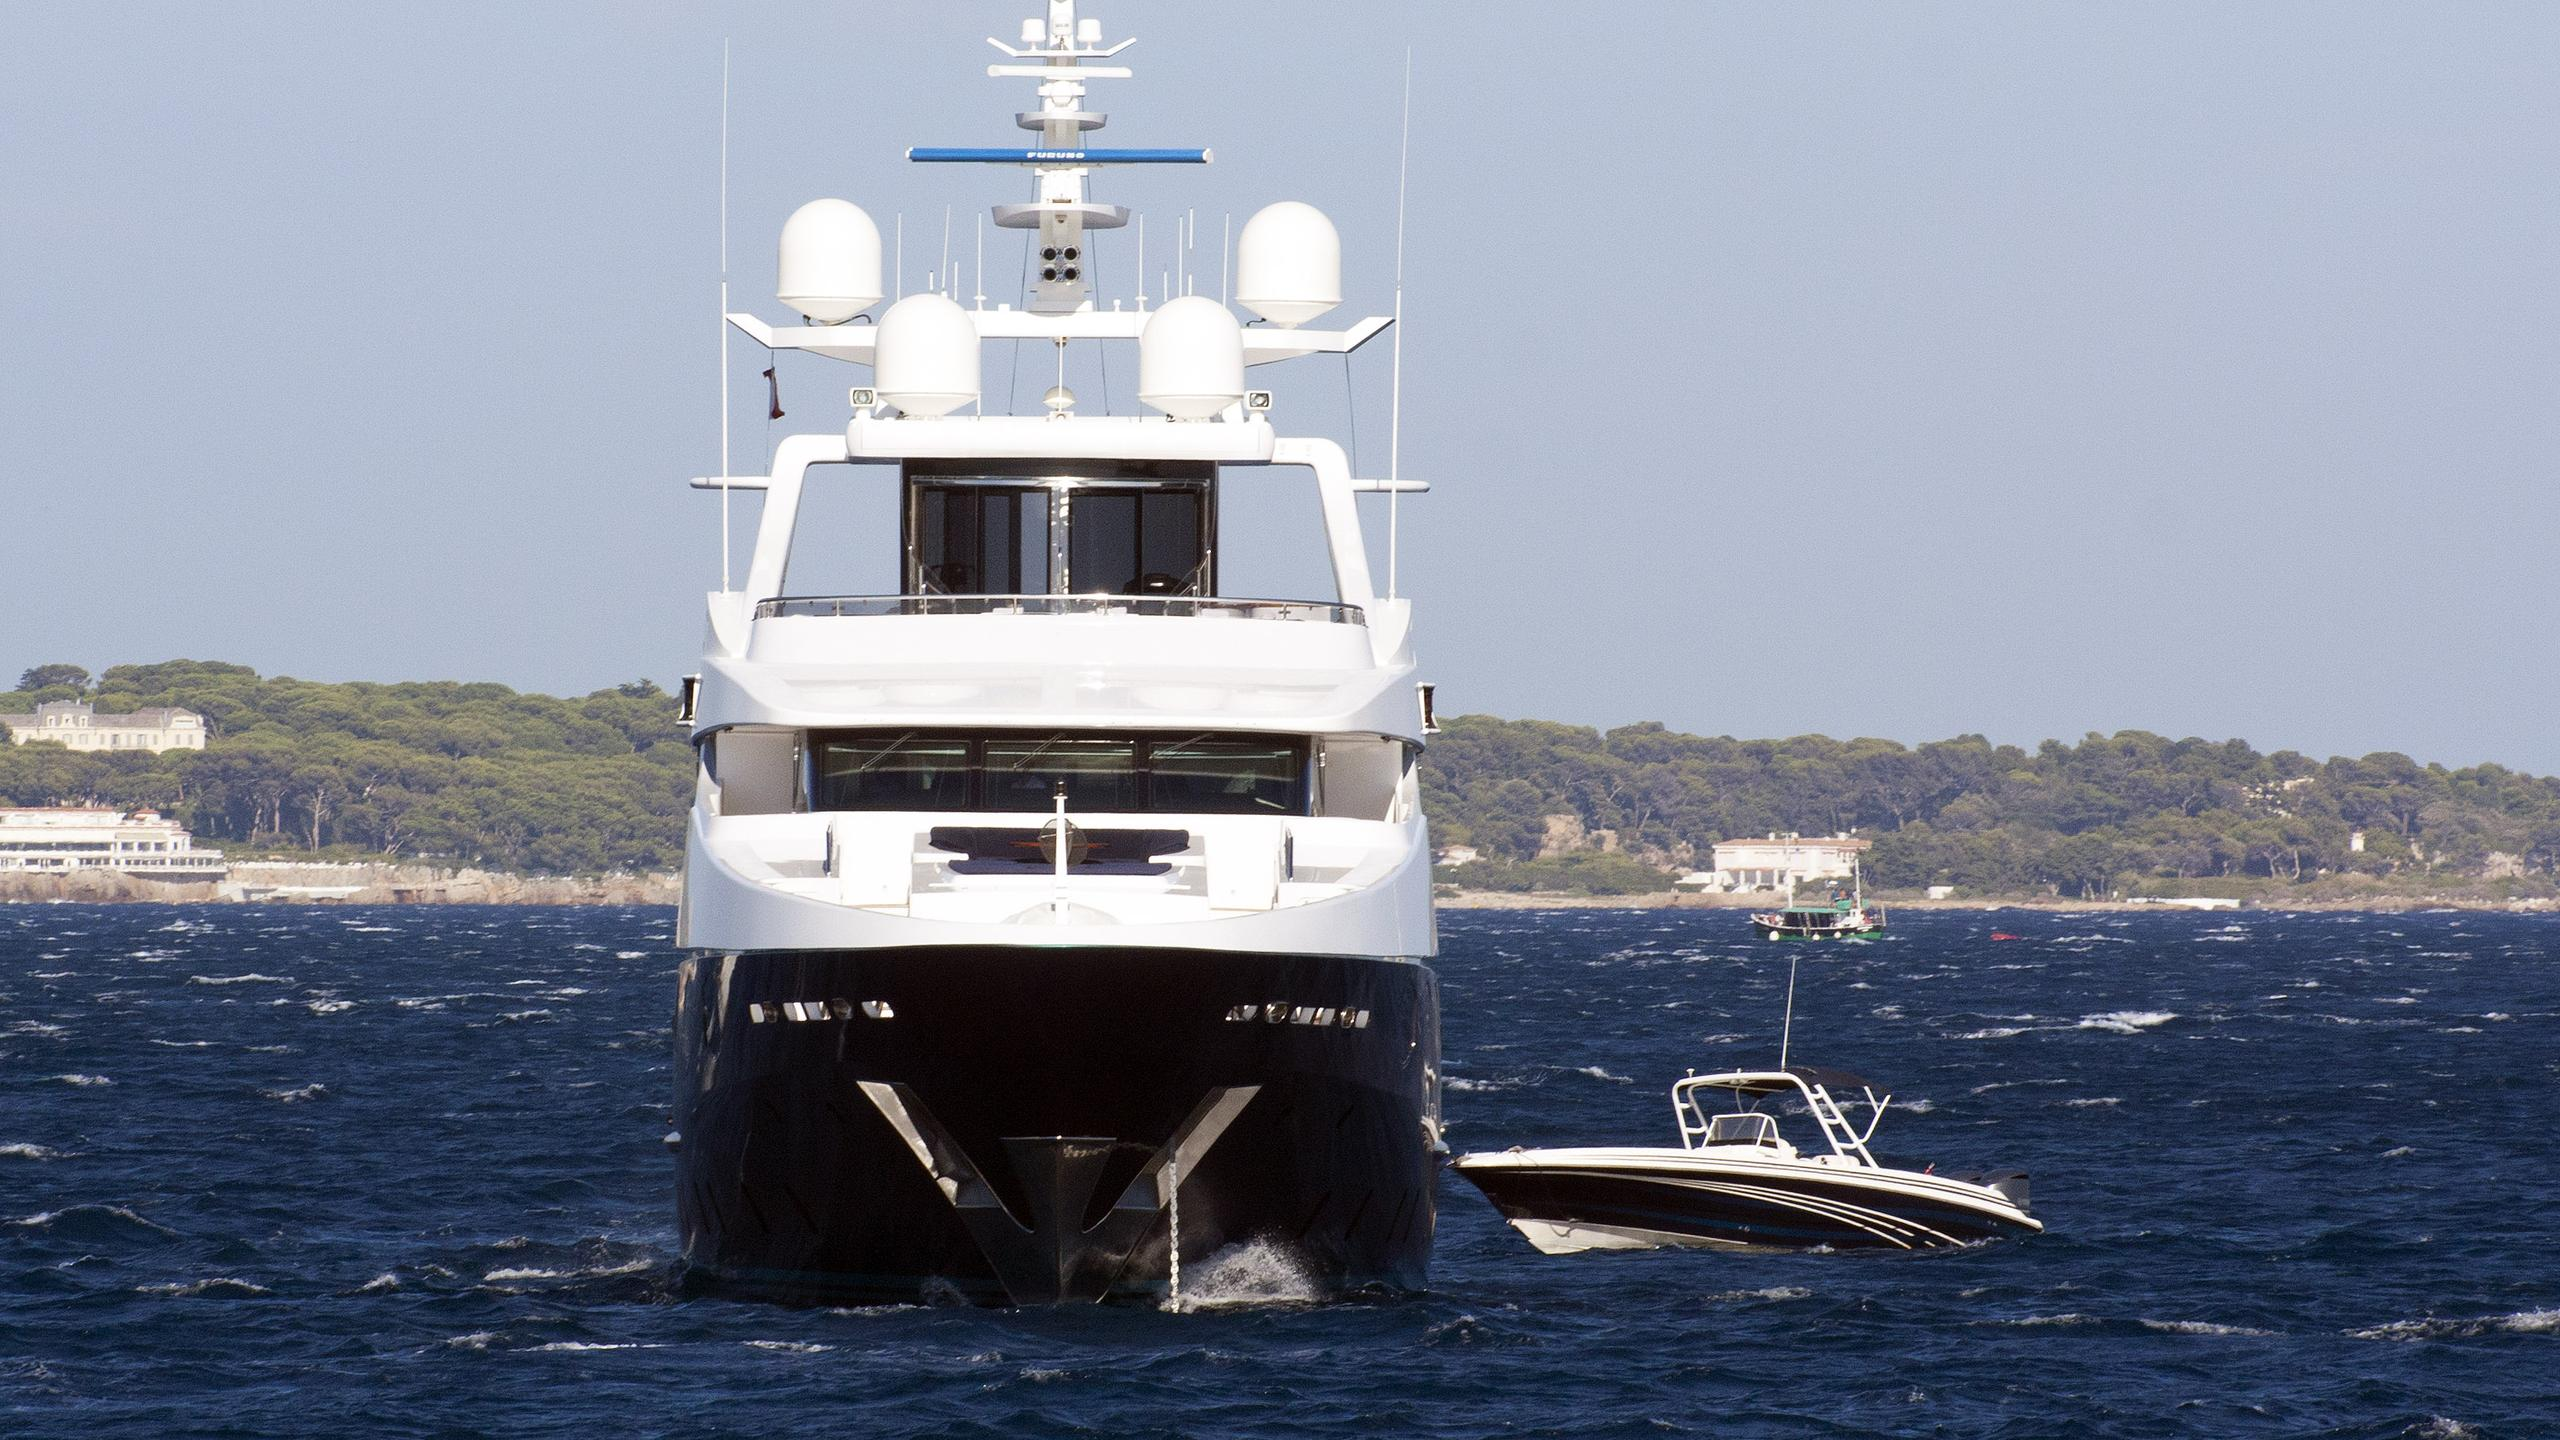 eleni alibi motoryacht cbi navi 2005 51m bow